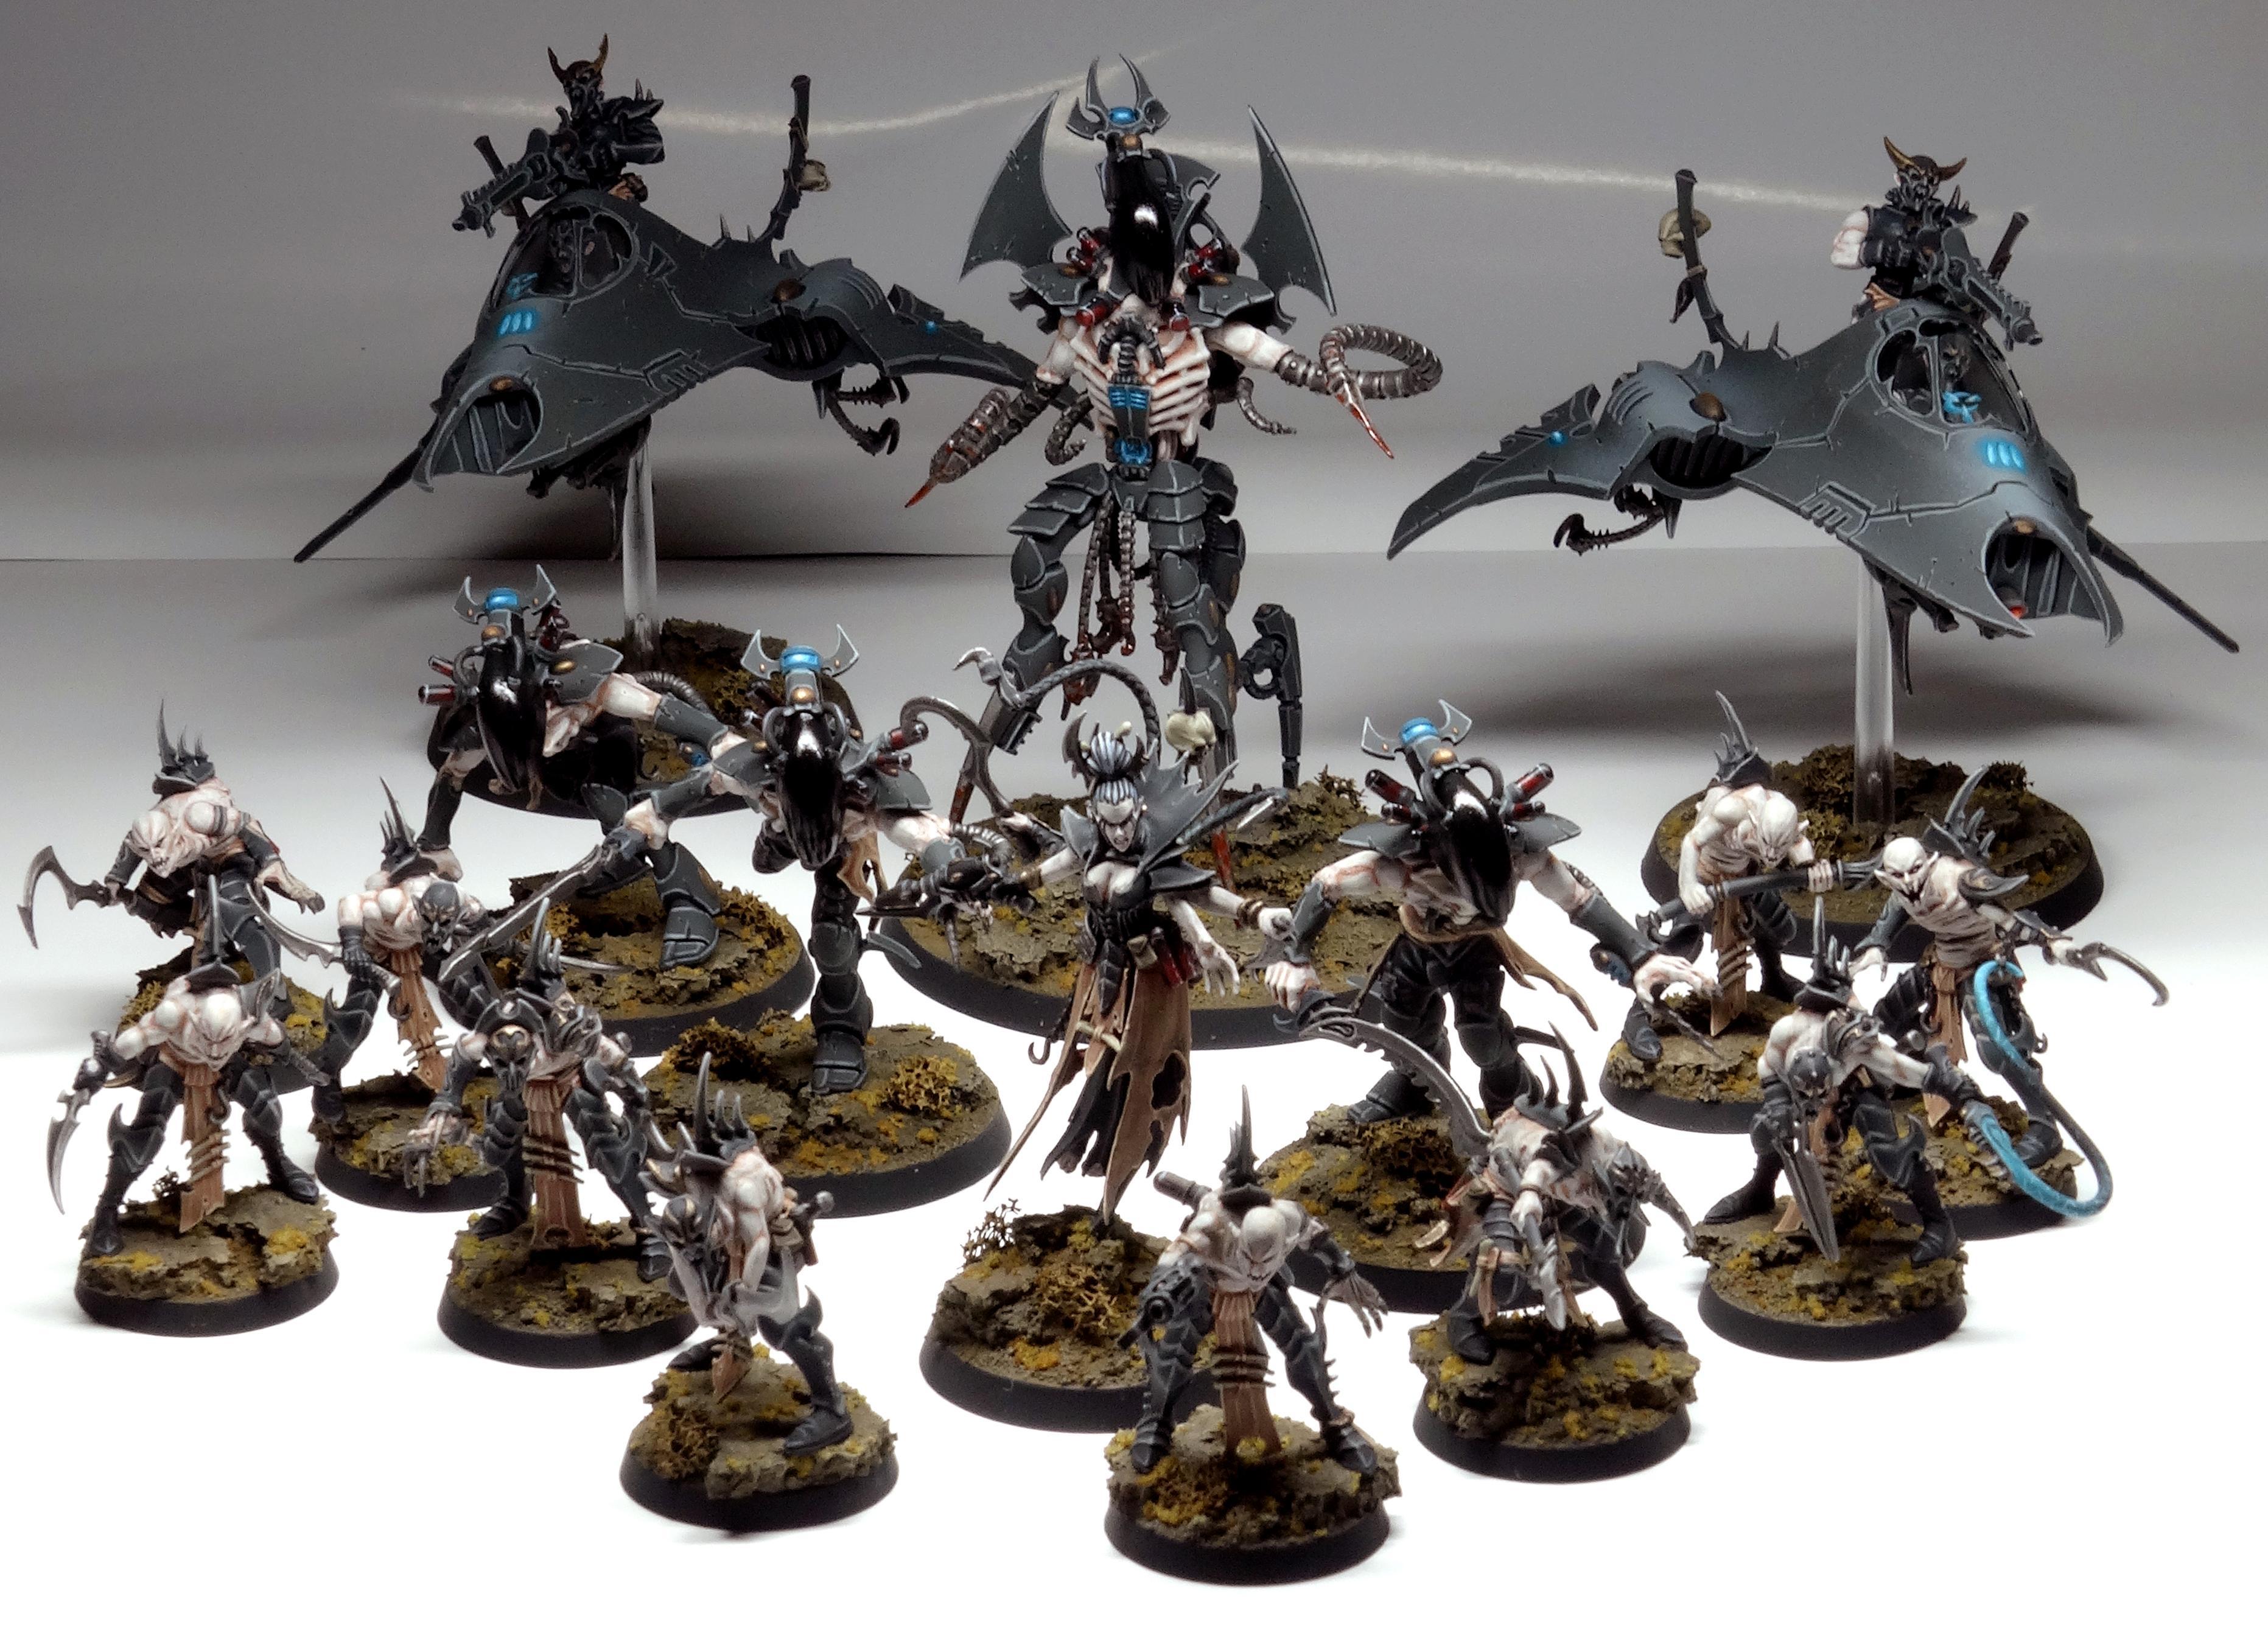 Army, Commoragh, Conversion, Coven, Cronos, Dark Eldar, Drukhari, Grotesques, Haemonculus, Kabal, Kitbash, Object Source Lighting, Venom, Warhammer 40,000, Warhammer Fantasy, Wracks, Xenos